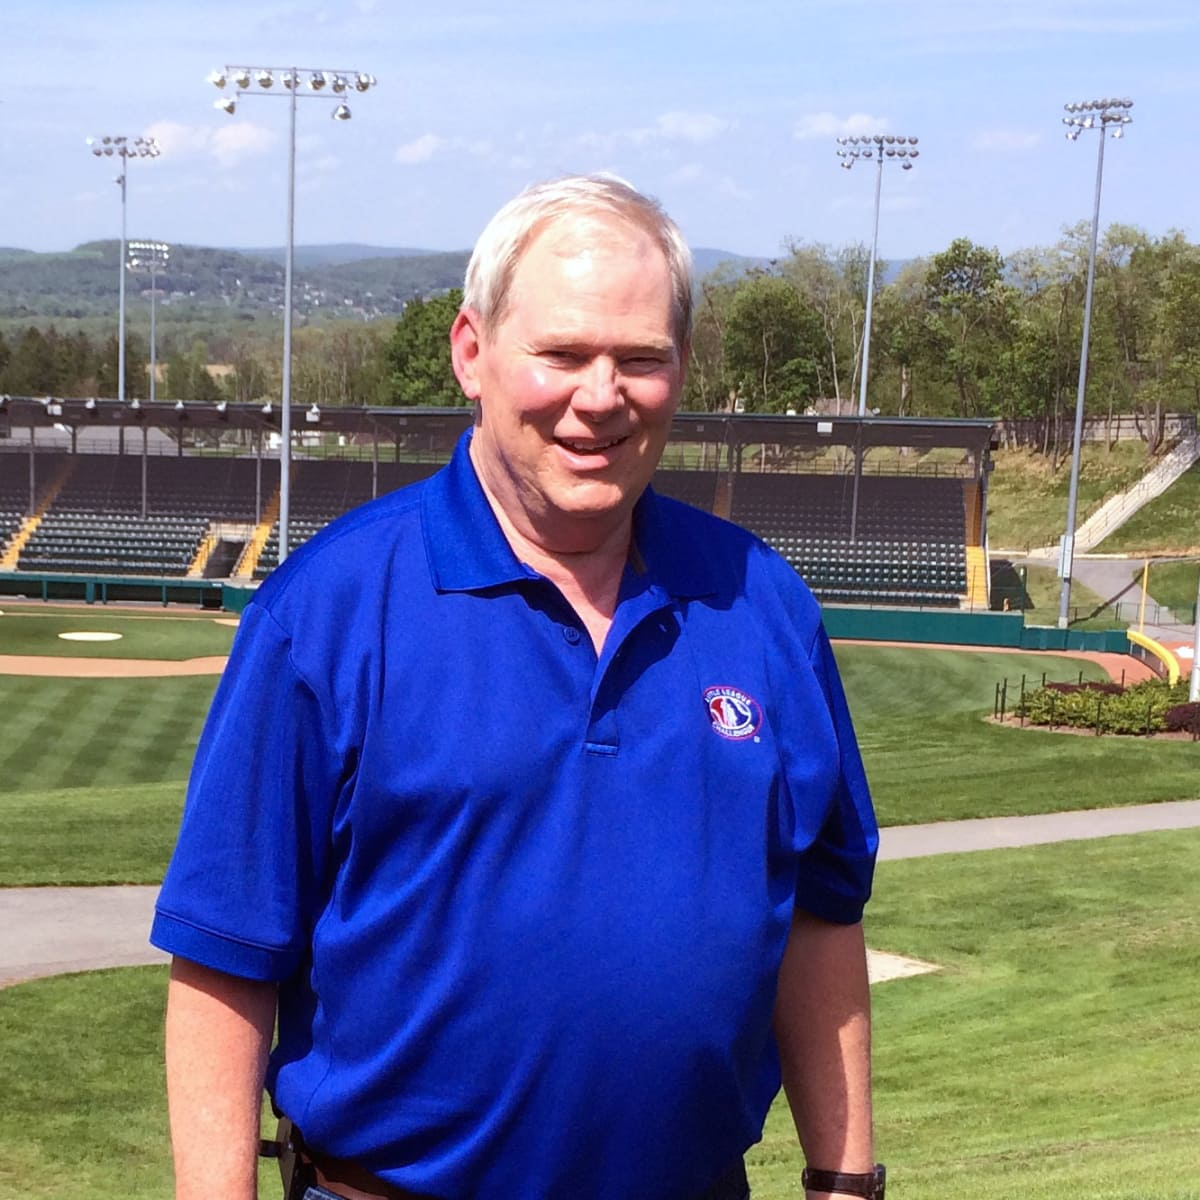 Houston, Bruce Hicks Little League umpire, August 2017, Bruce Hicks in Williamsport